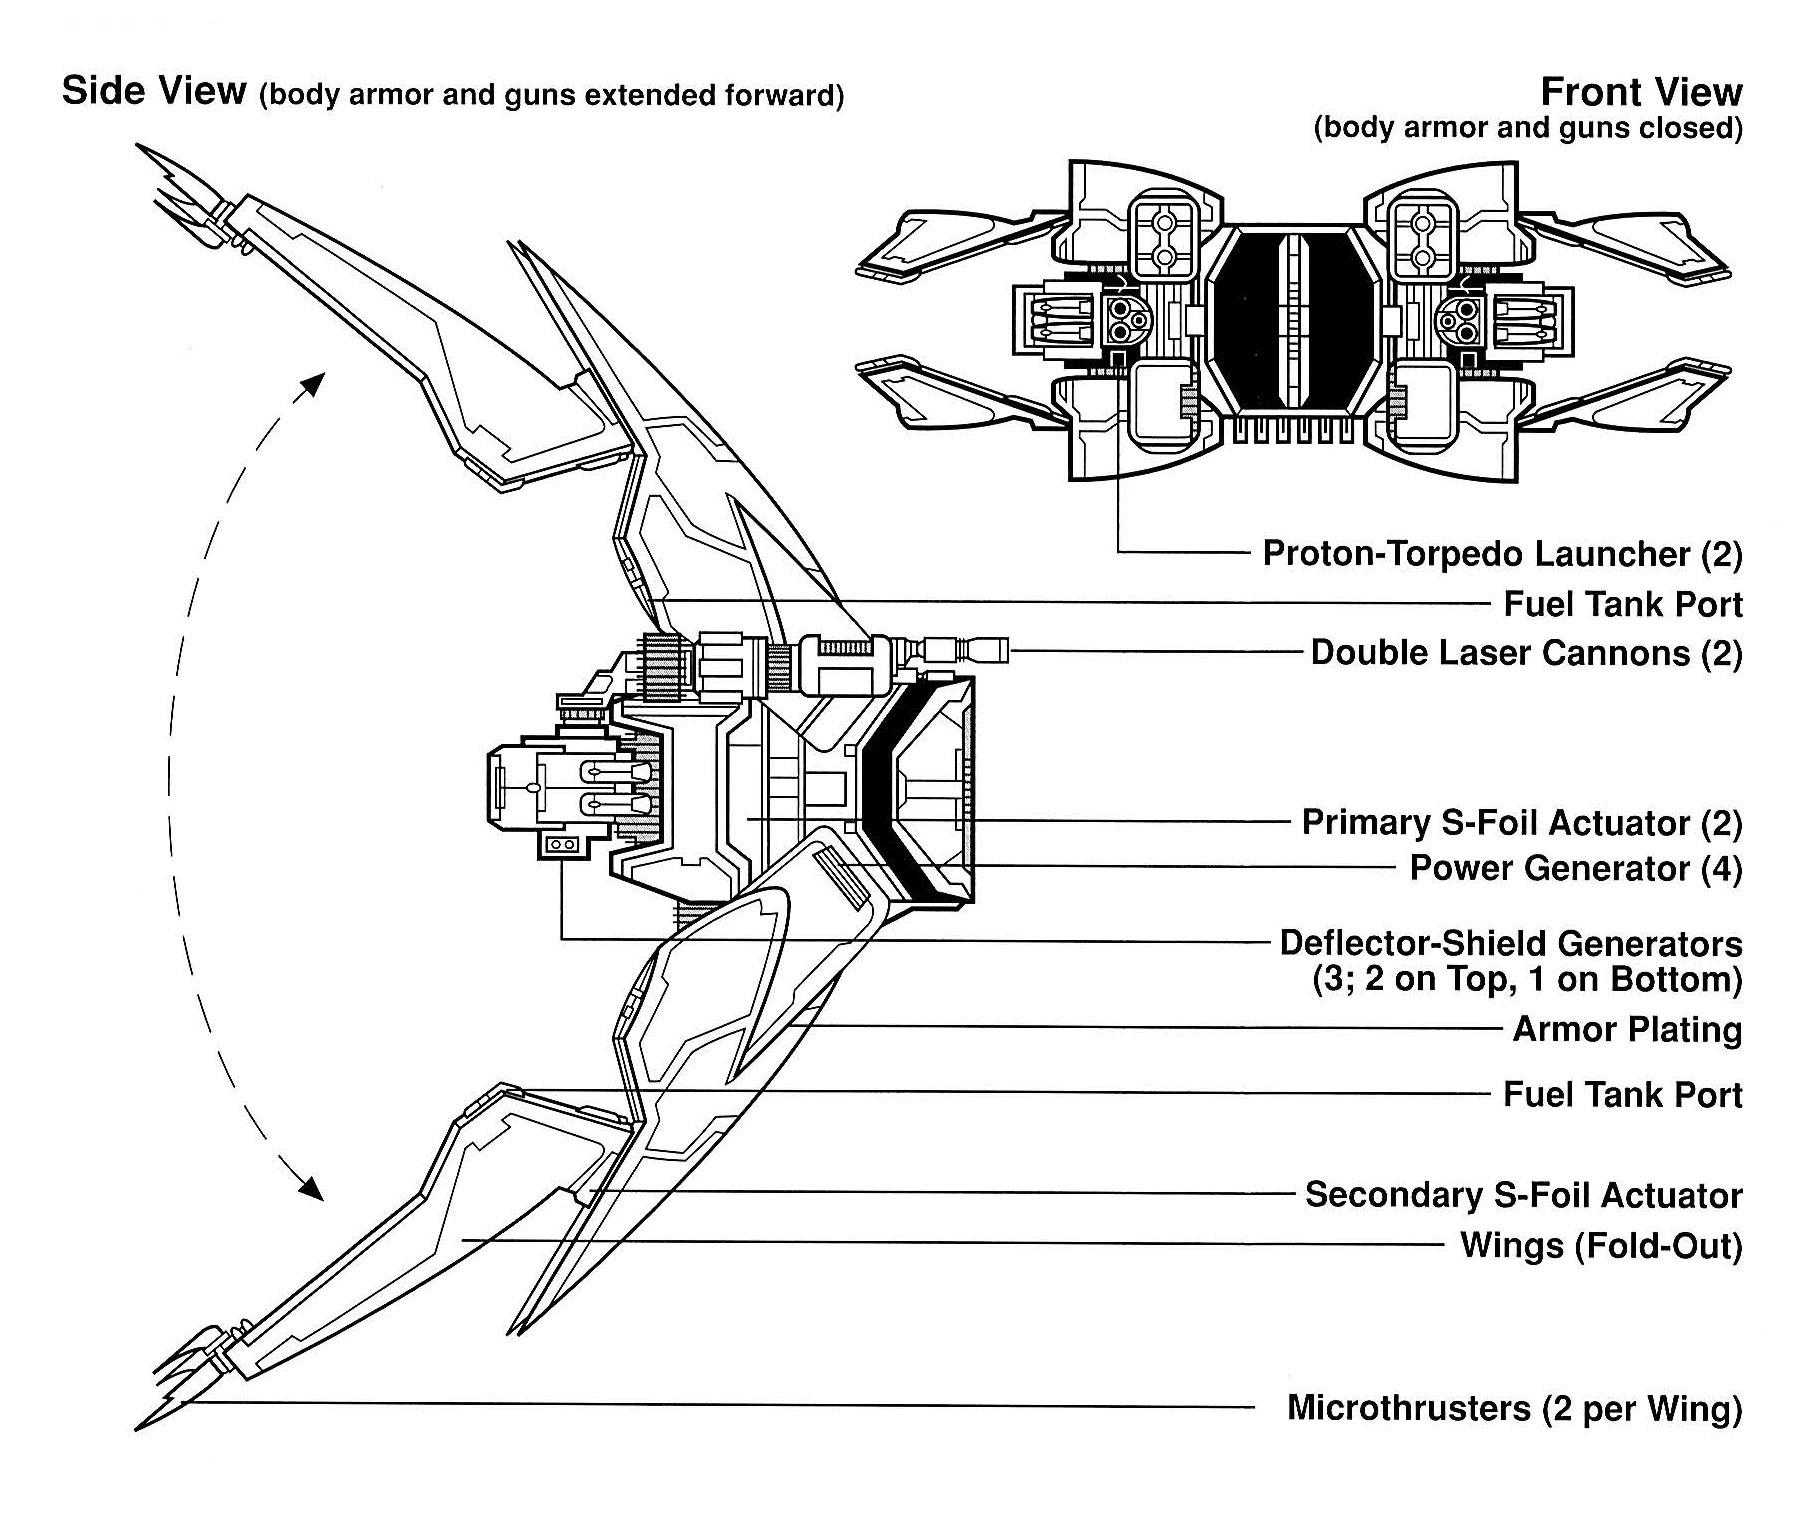 The Spacebattles Thread